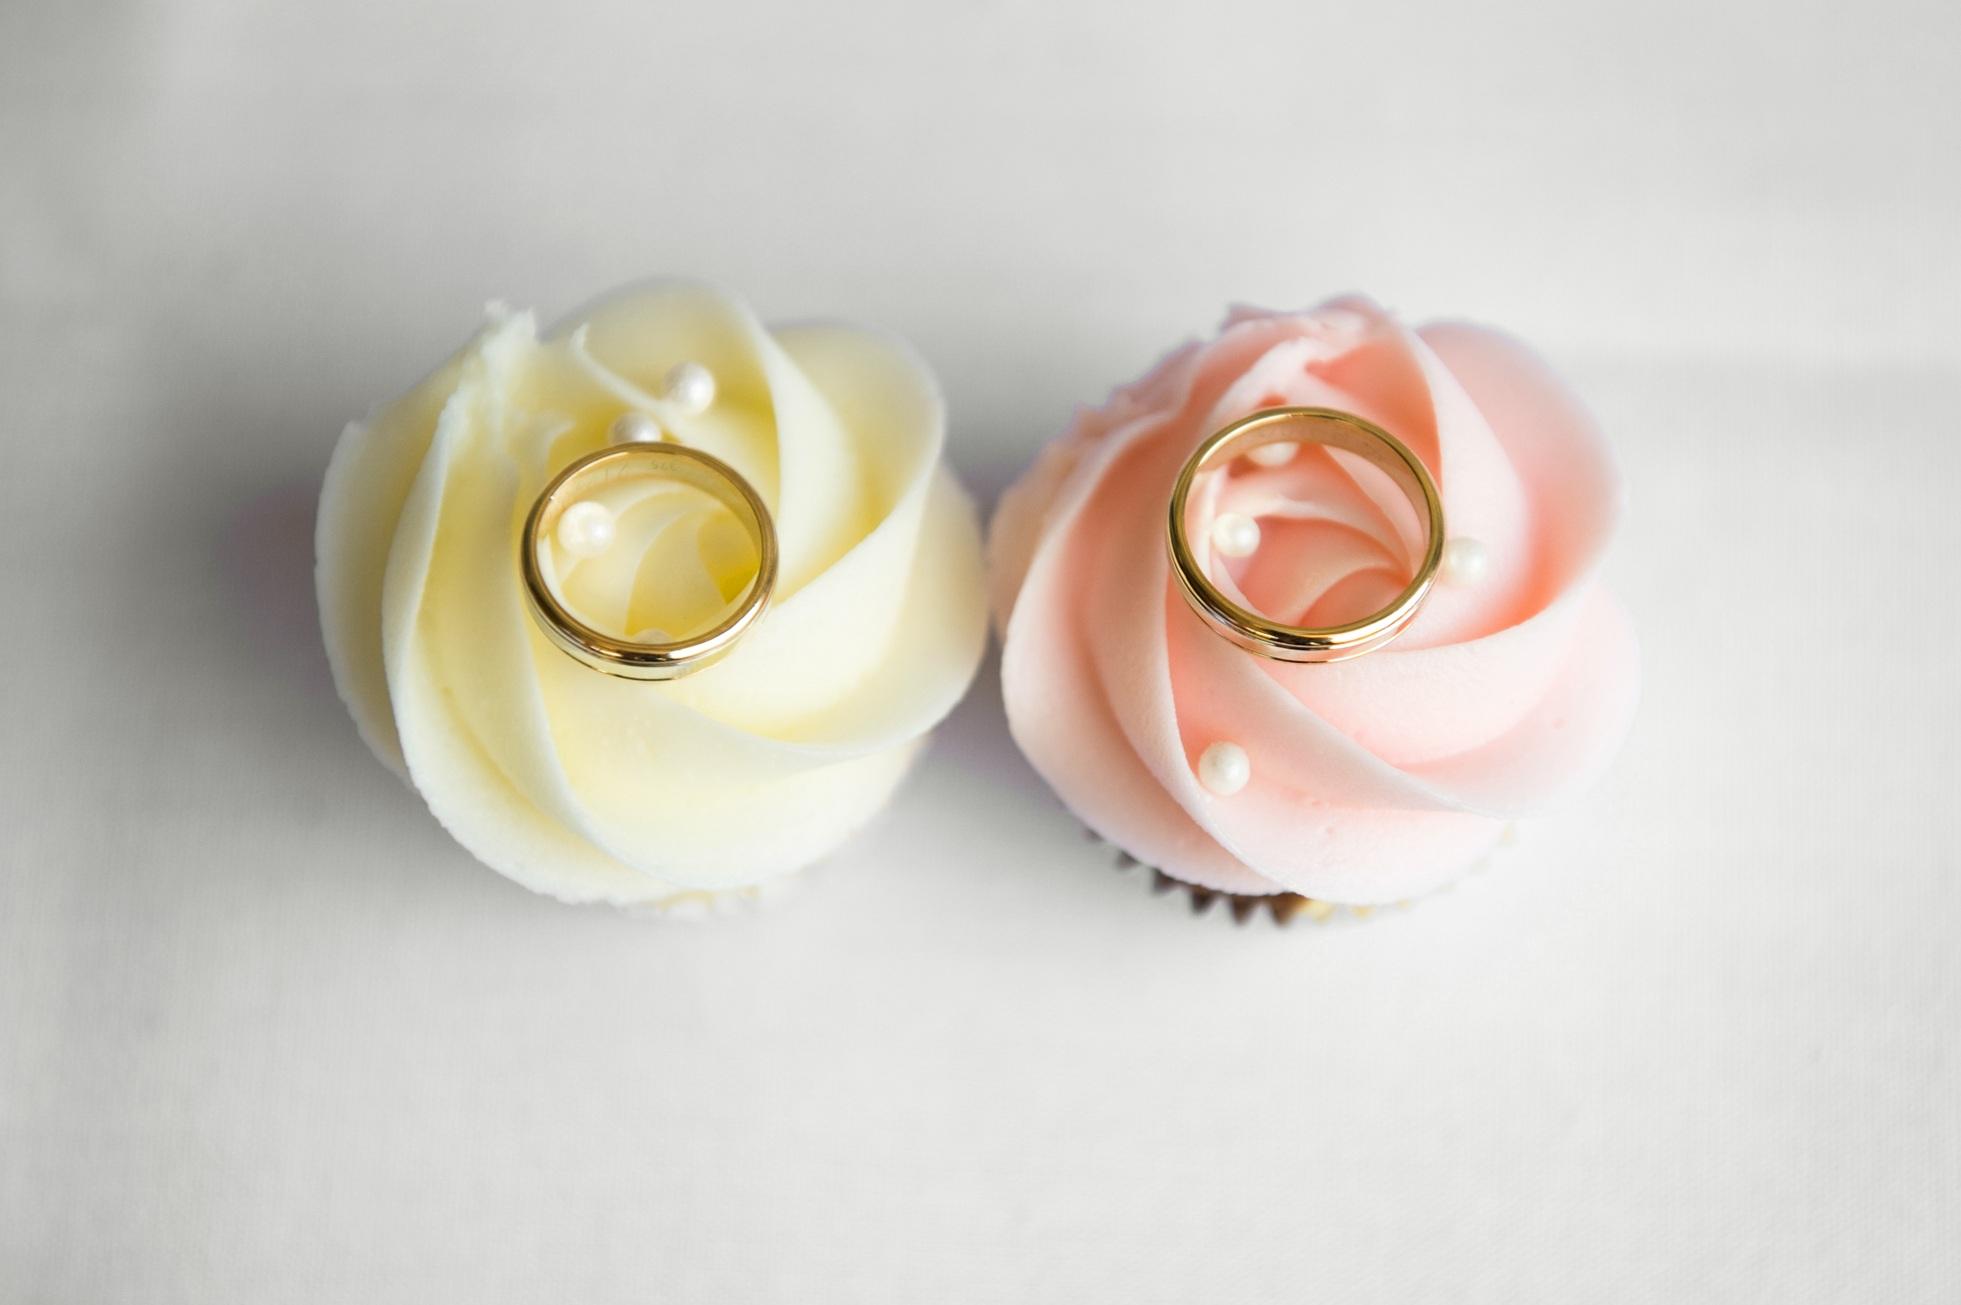 Wedding cake wedding wedding rings